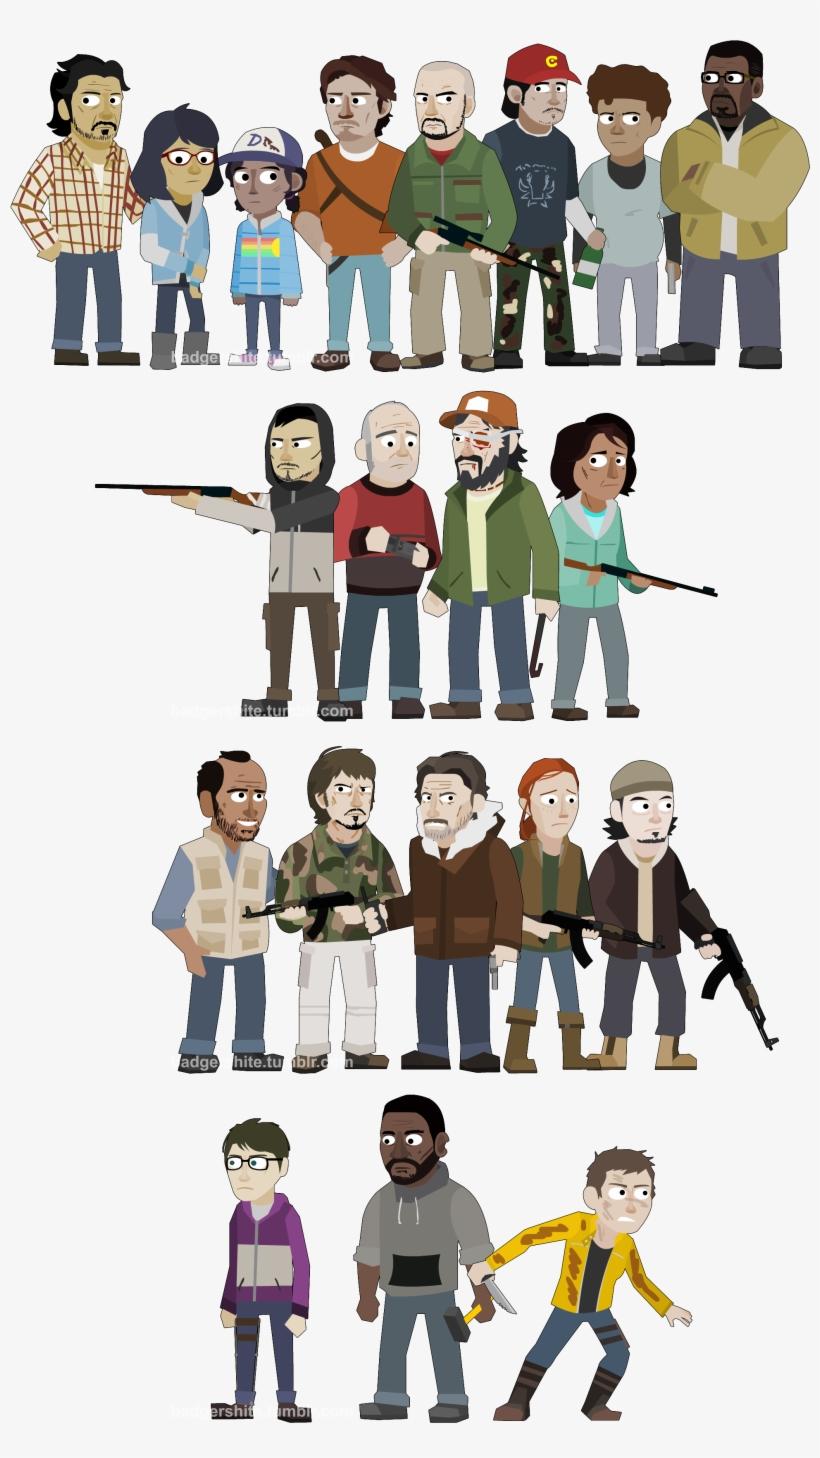 The walking dead the final season clipart vector freeuse The Walking Dead Game Fan Art - The Walking Dead vector freeuse